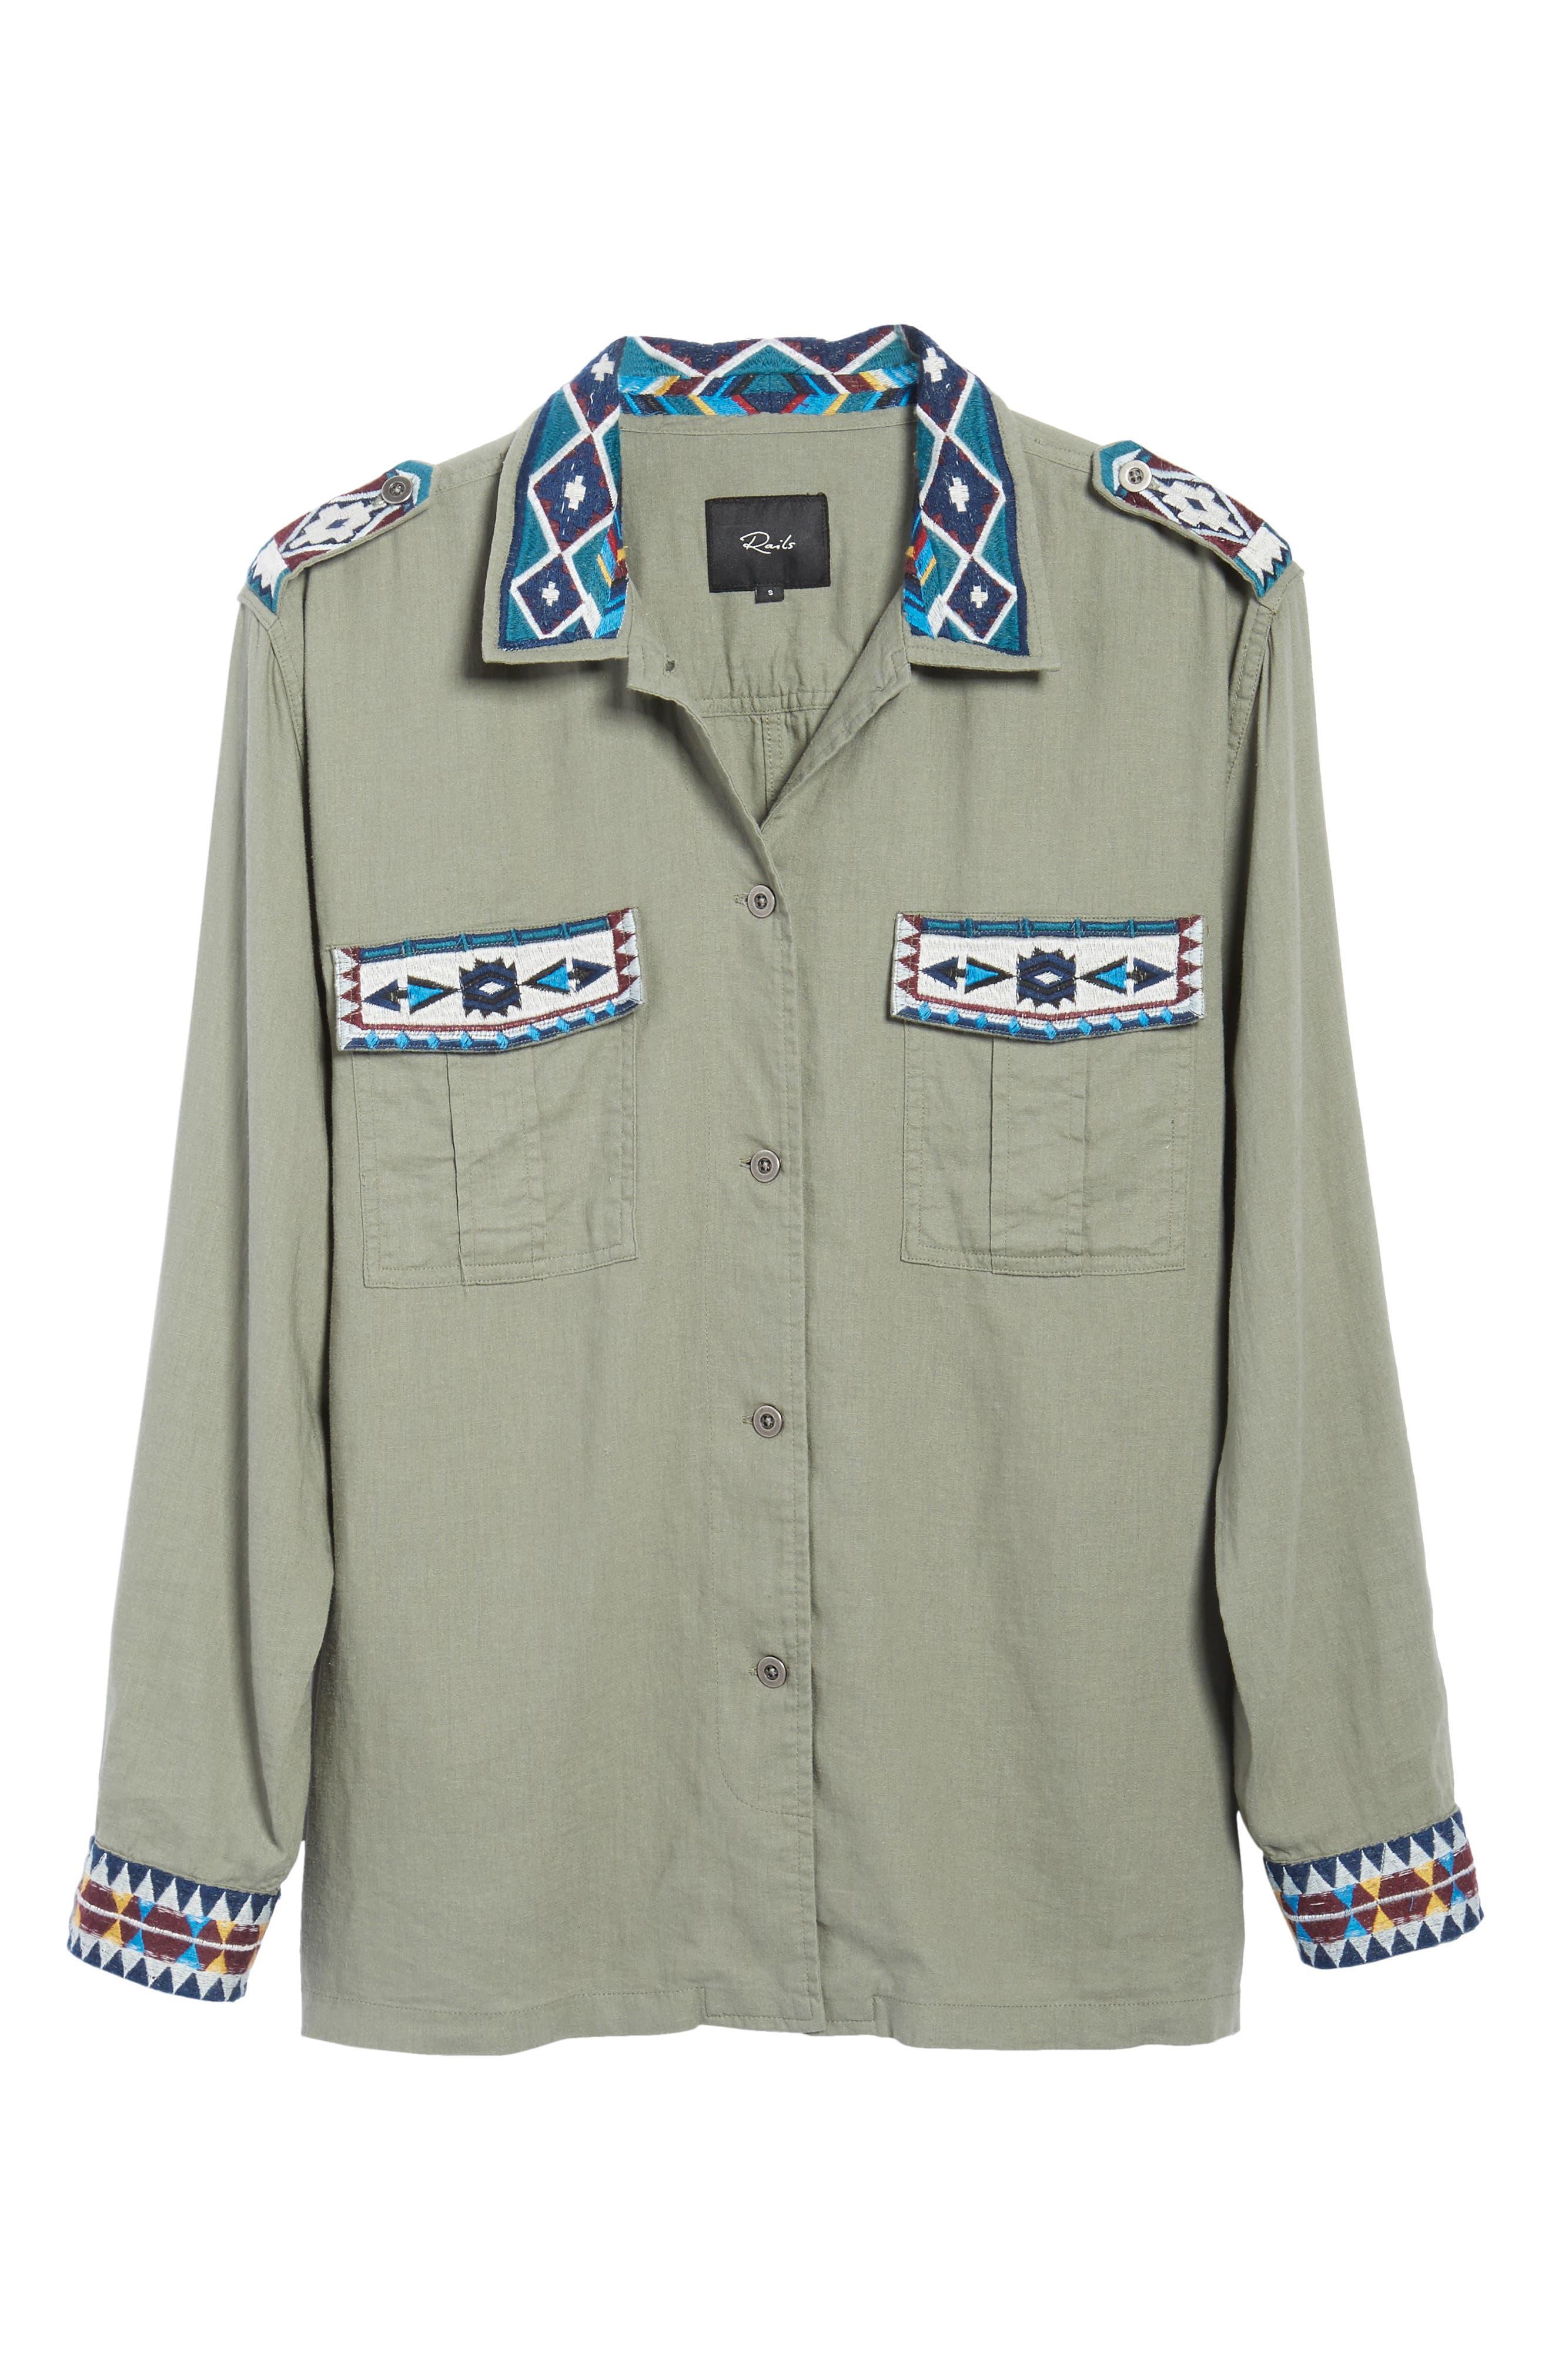 Kona Embroidered Shirt,                             Alternate thumbnail 6, color,                             320